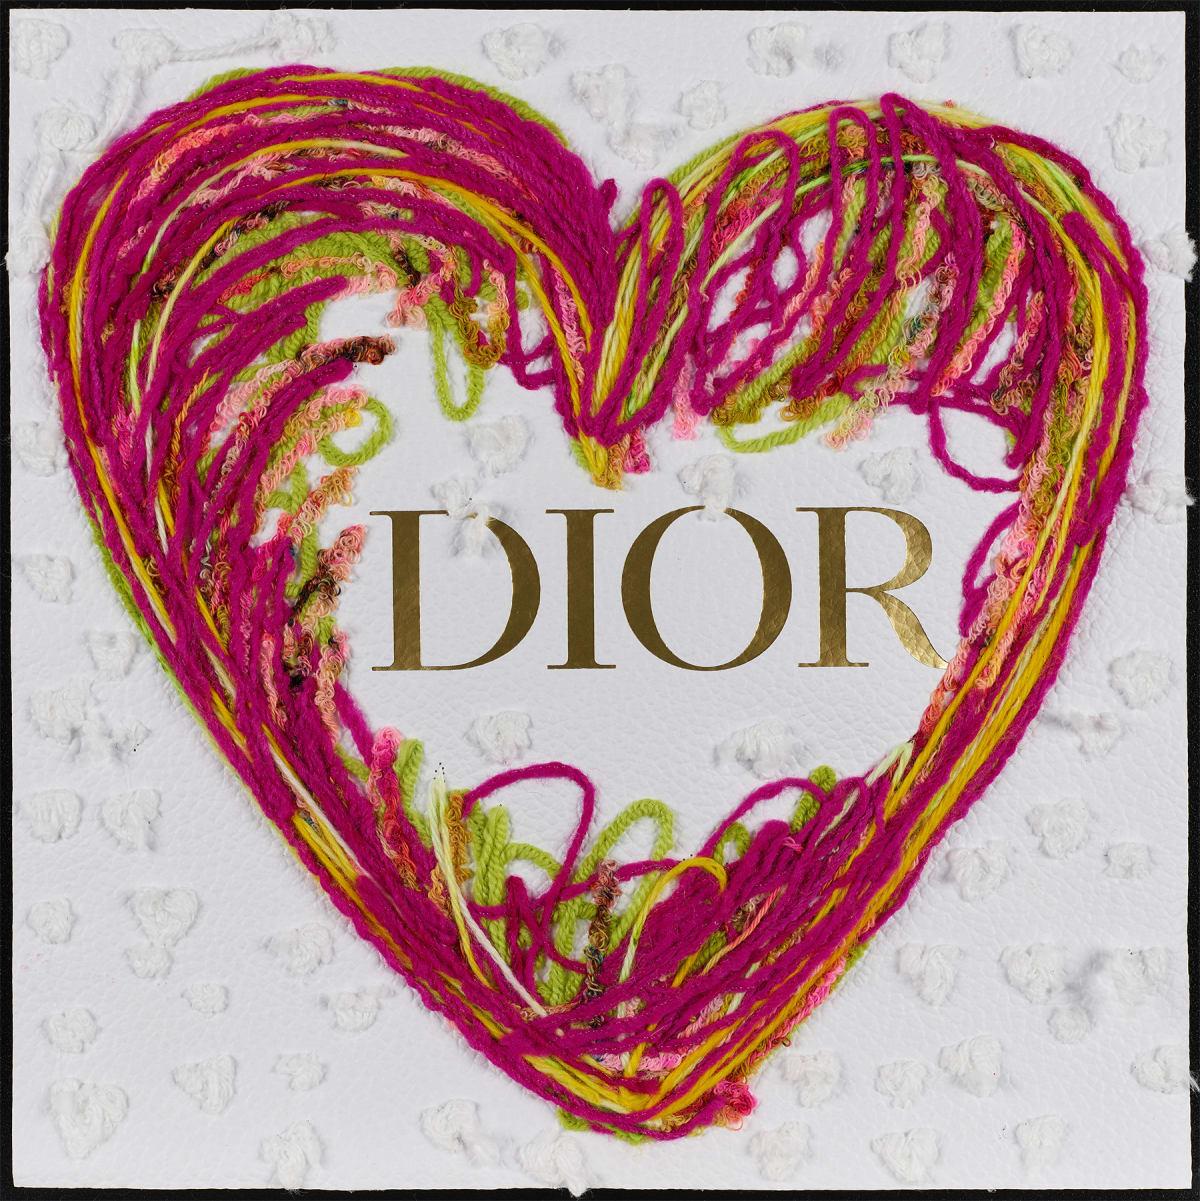 Stephen Wilson, Dior Sketchy Heart (Pink), 2019